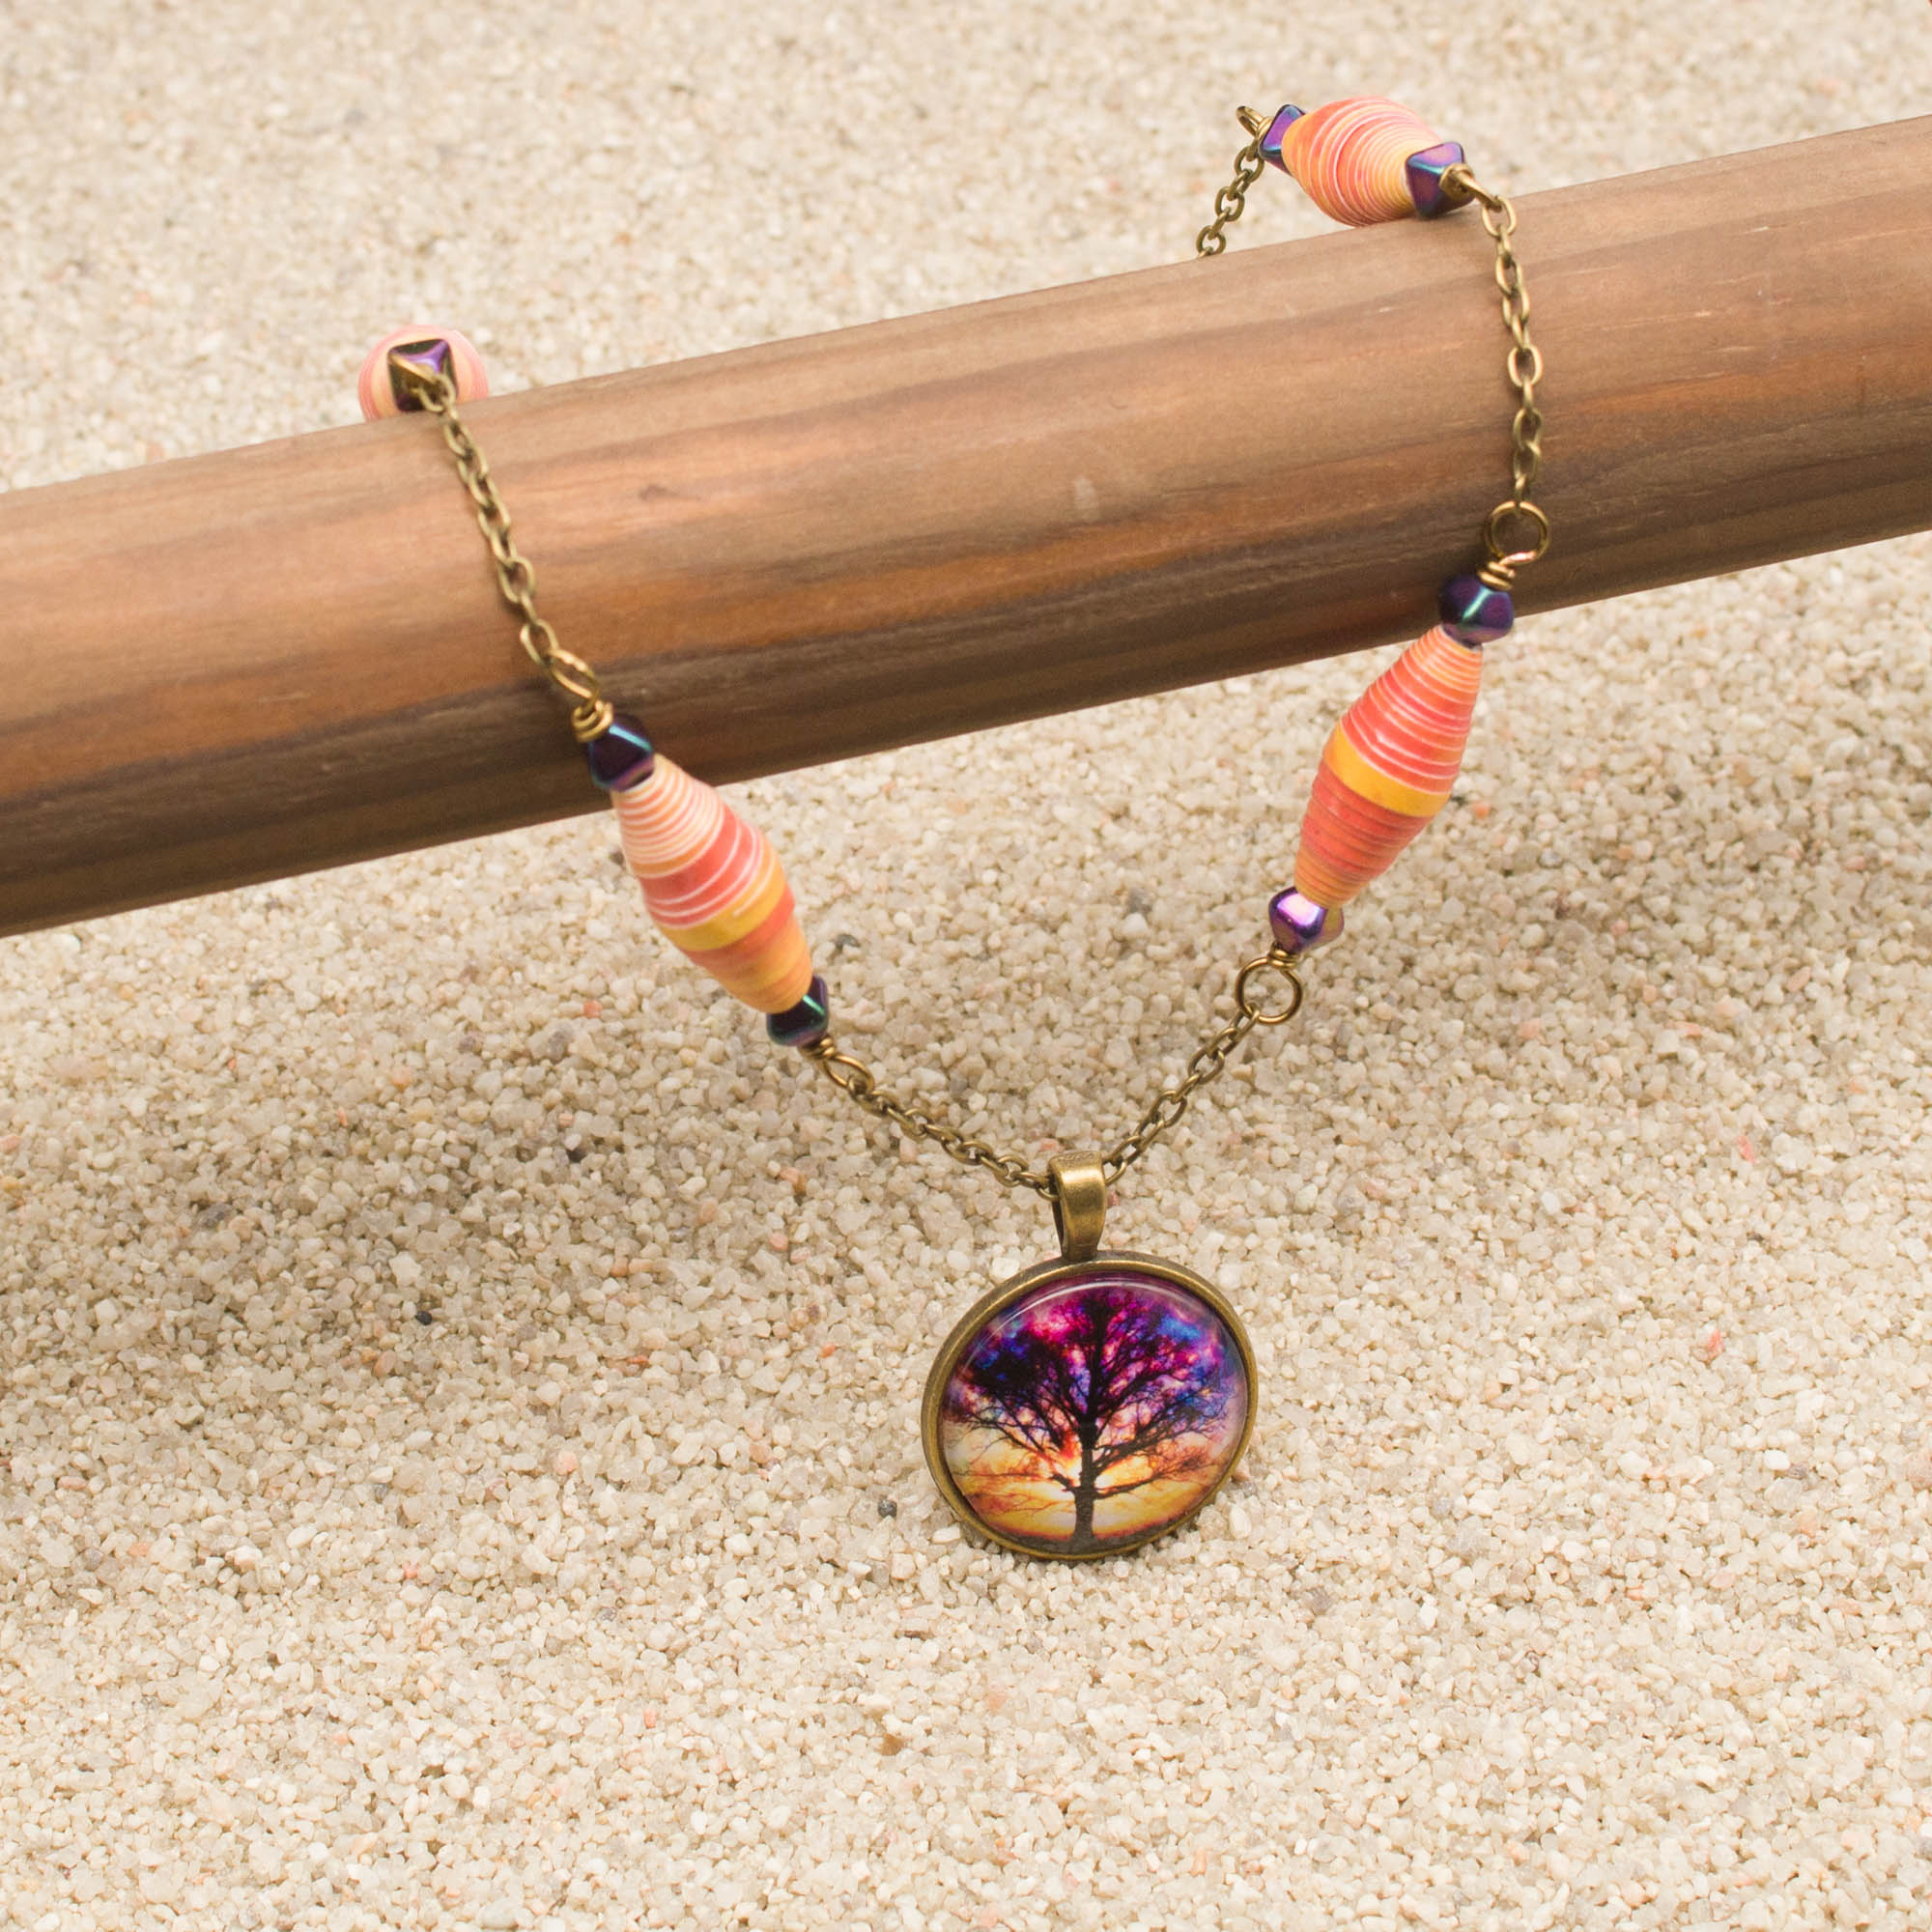 NE814LSa - Sunset Storm Necklace and Earring Set